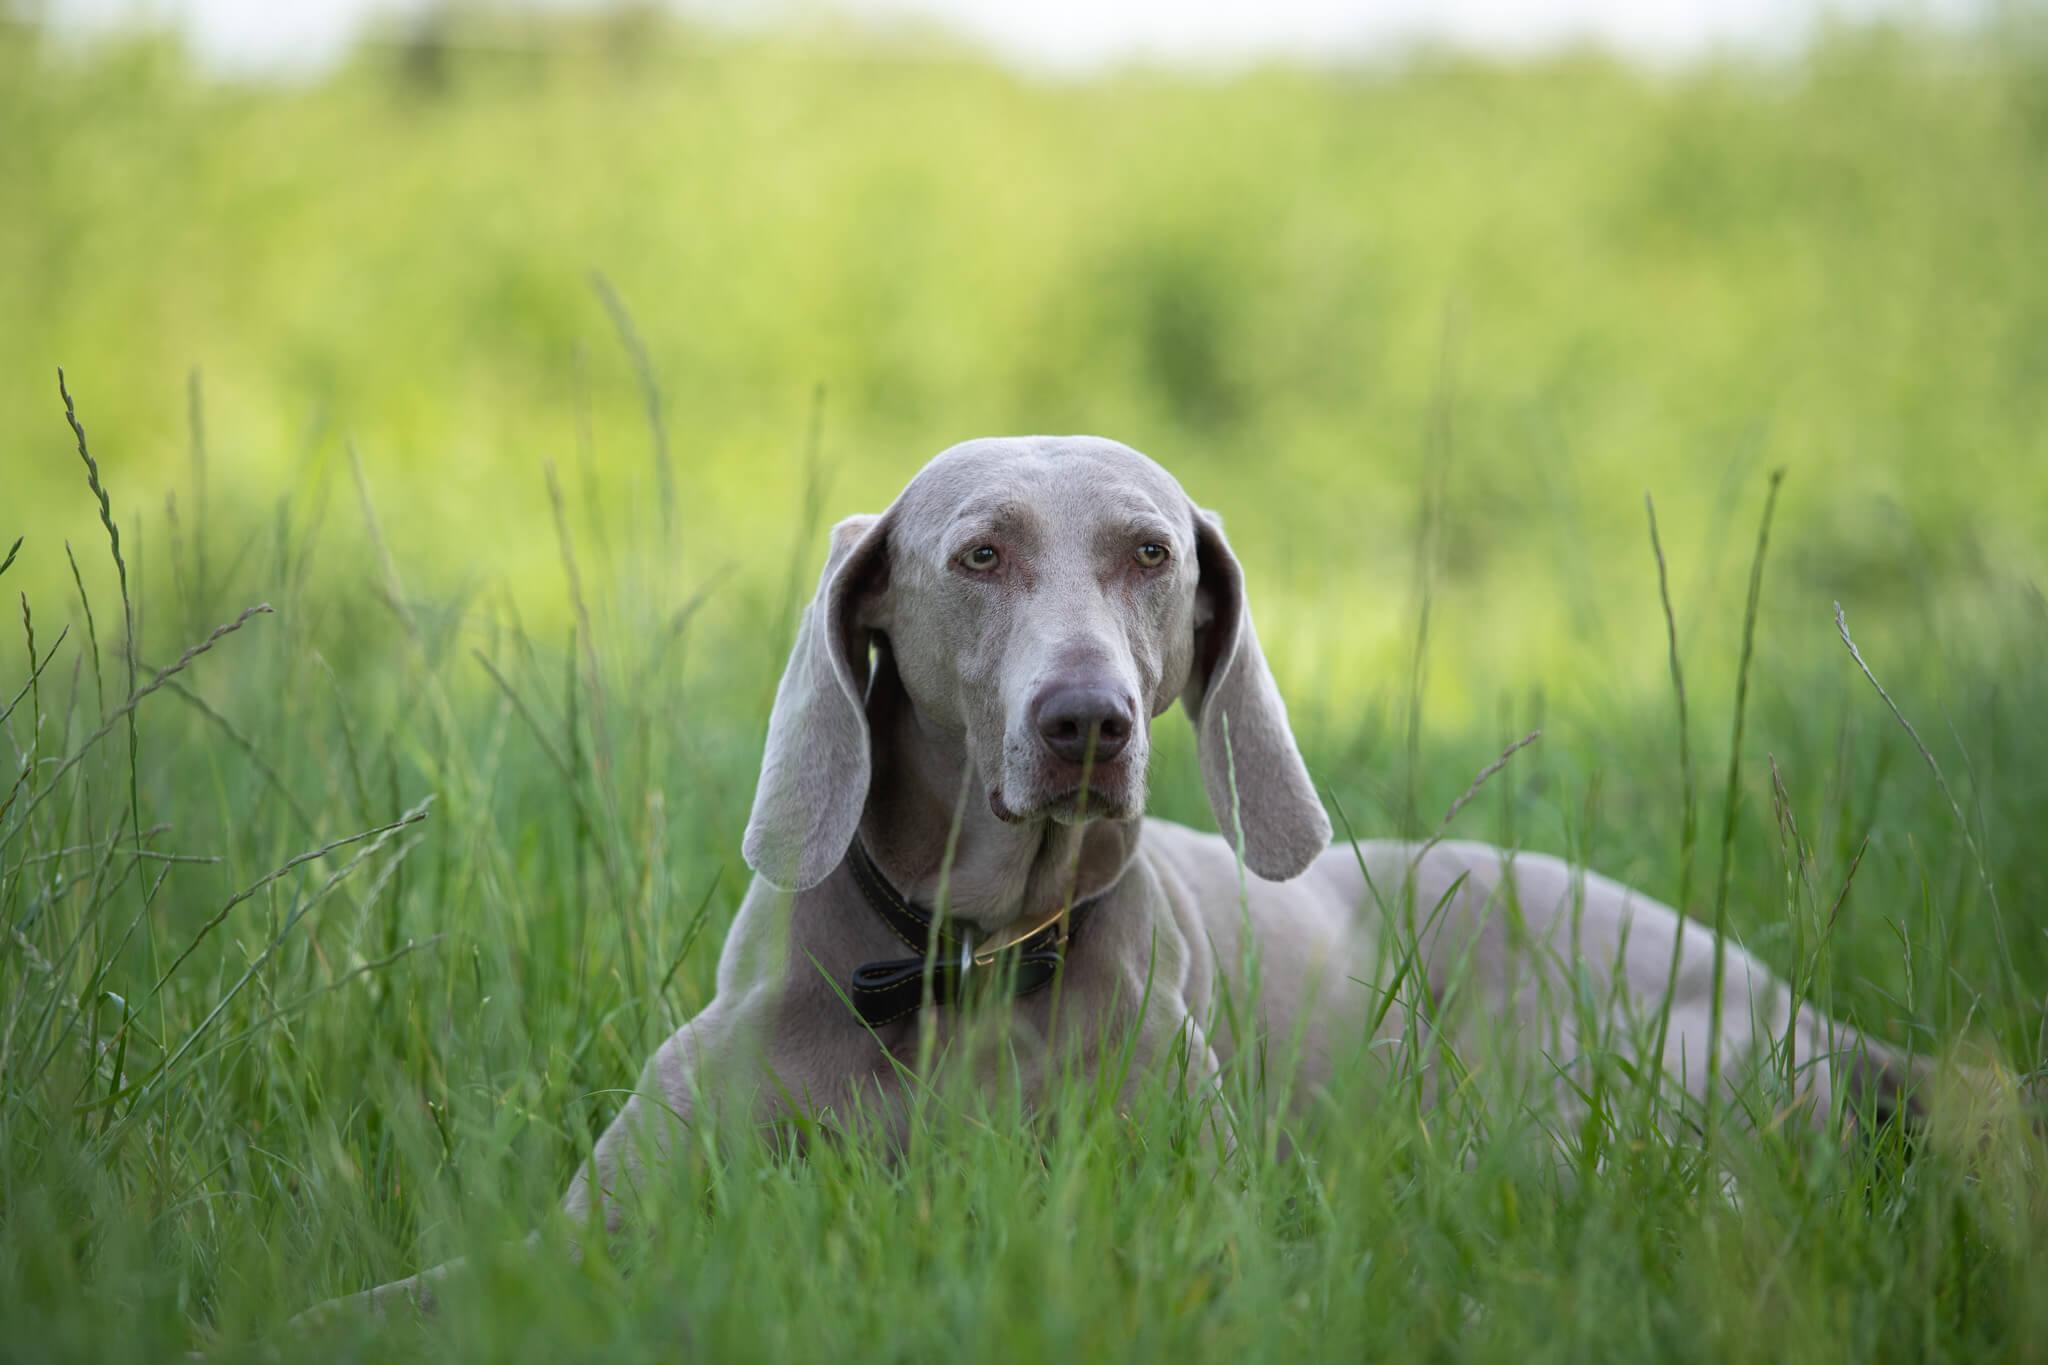 Weimaraner-Dog-Photoshoot